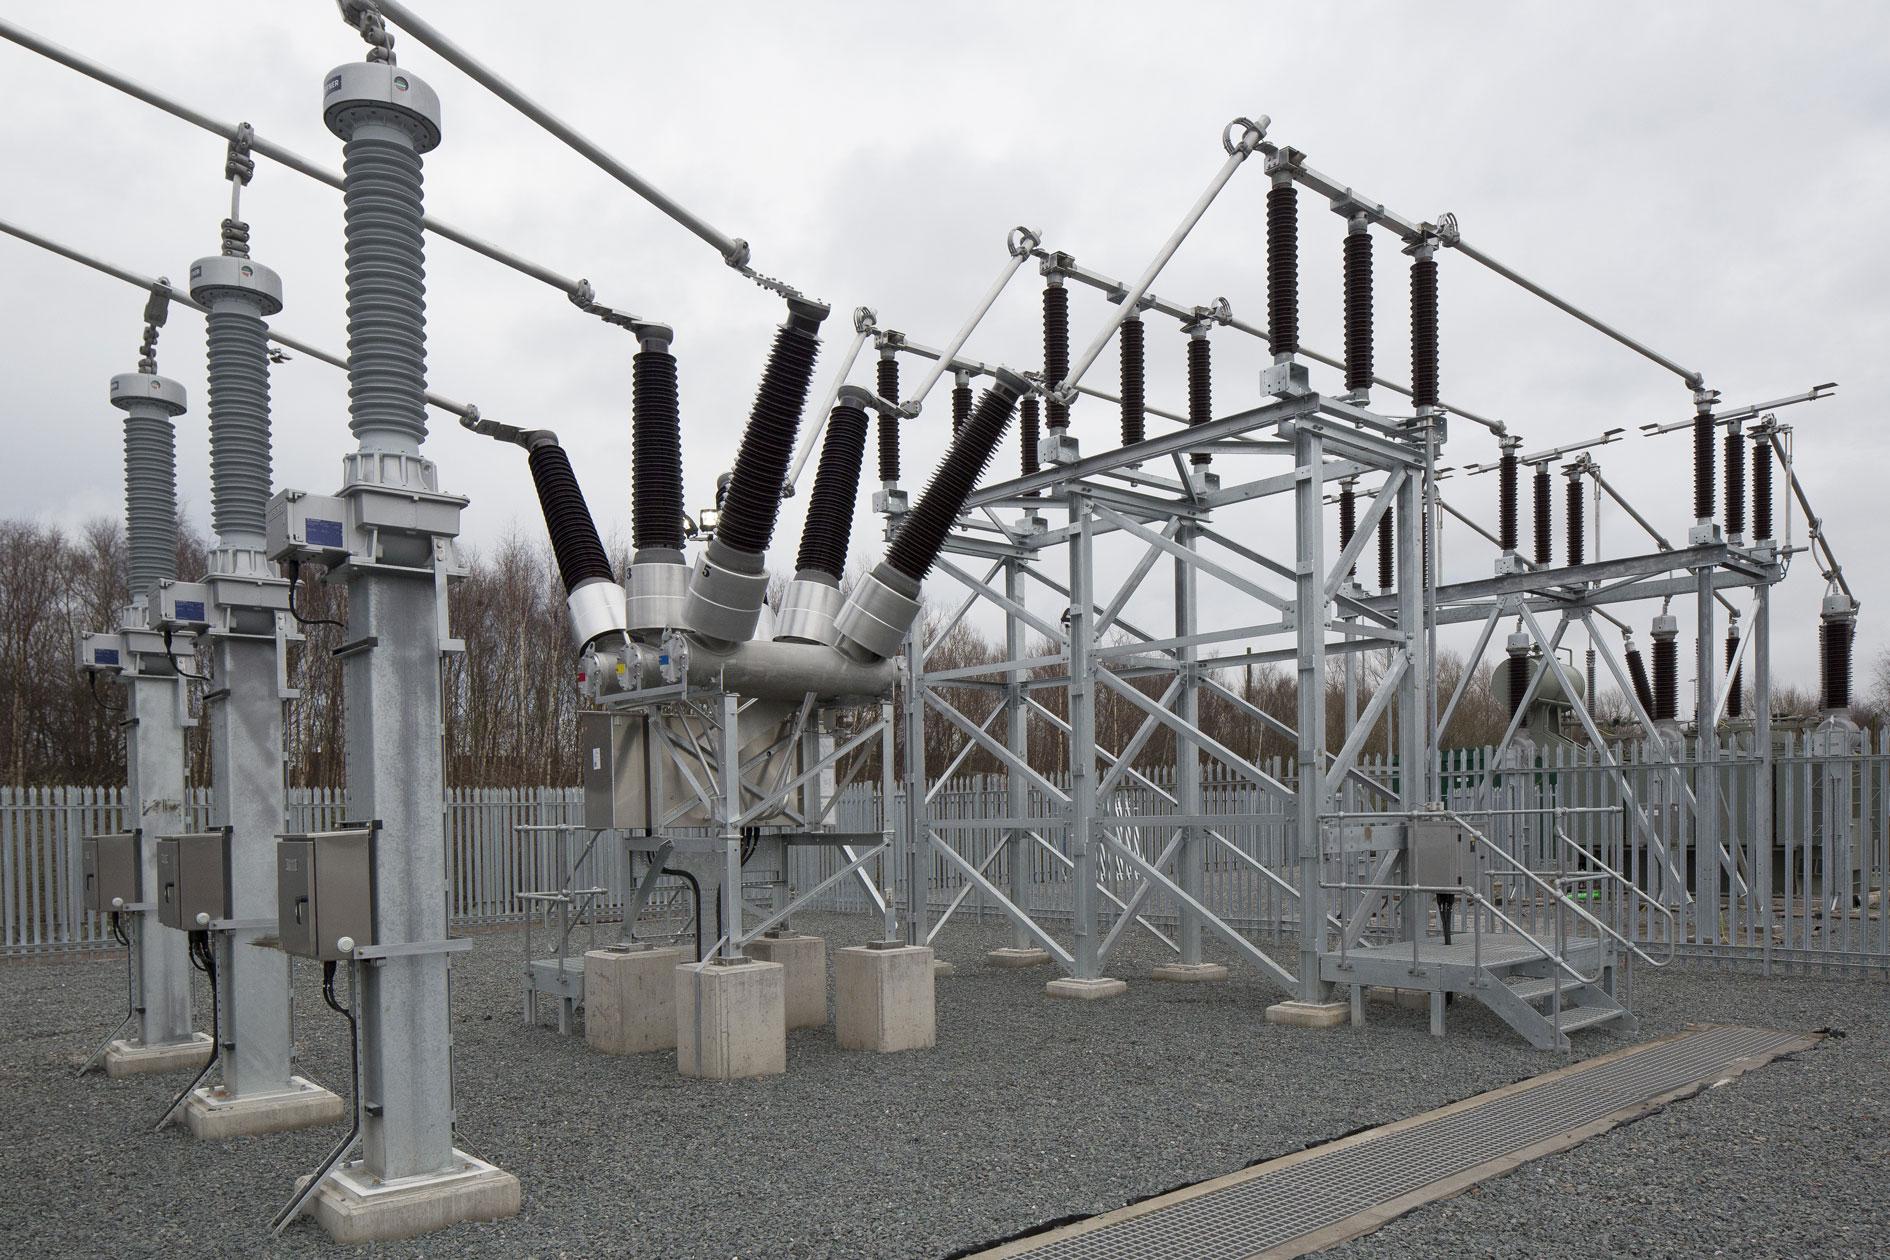 132kV connection in Birmingham